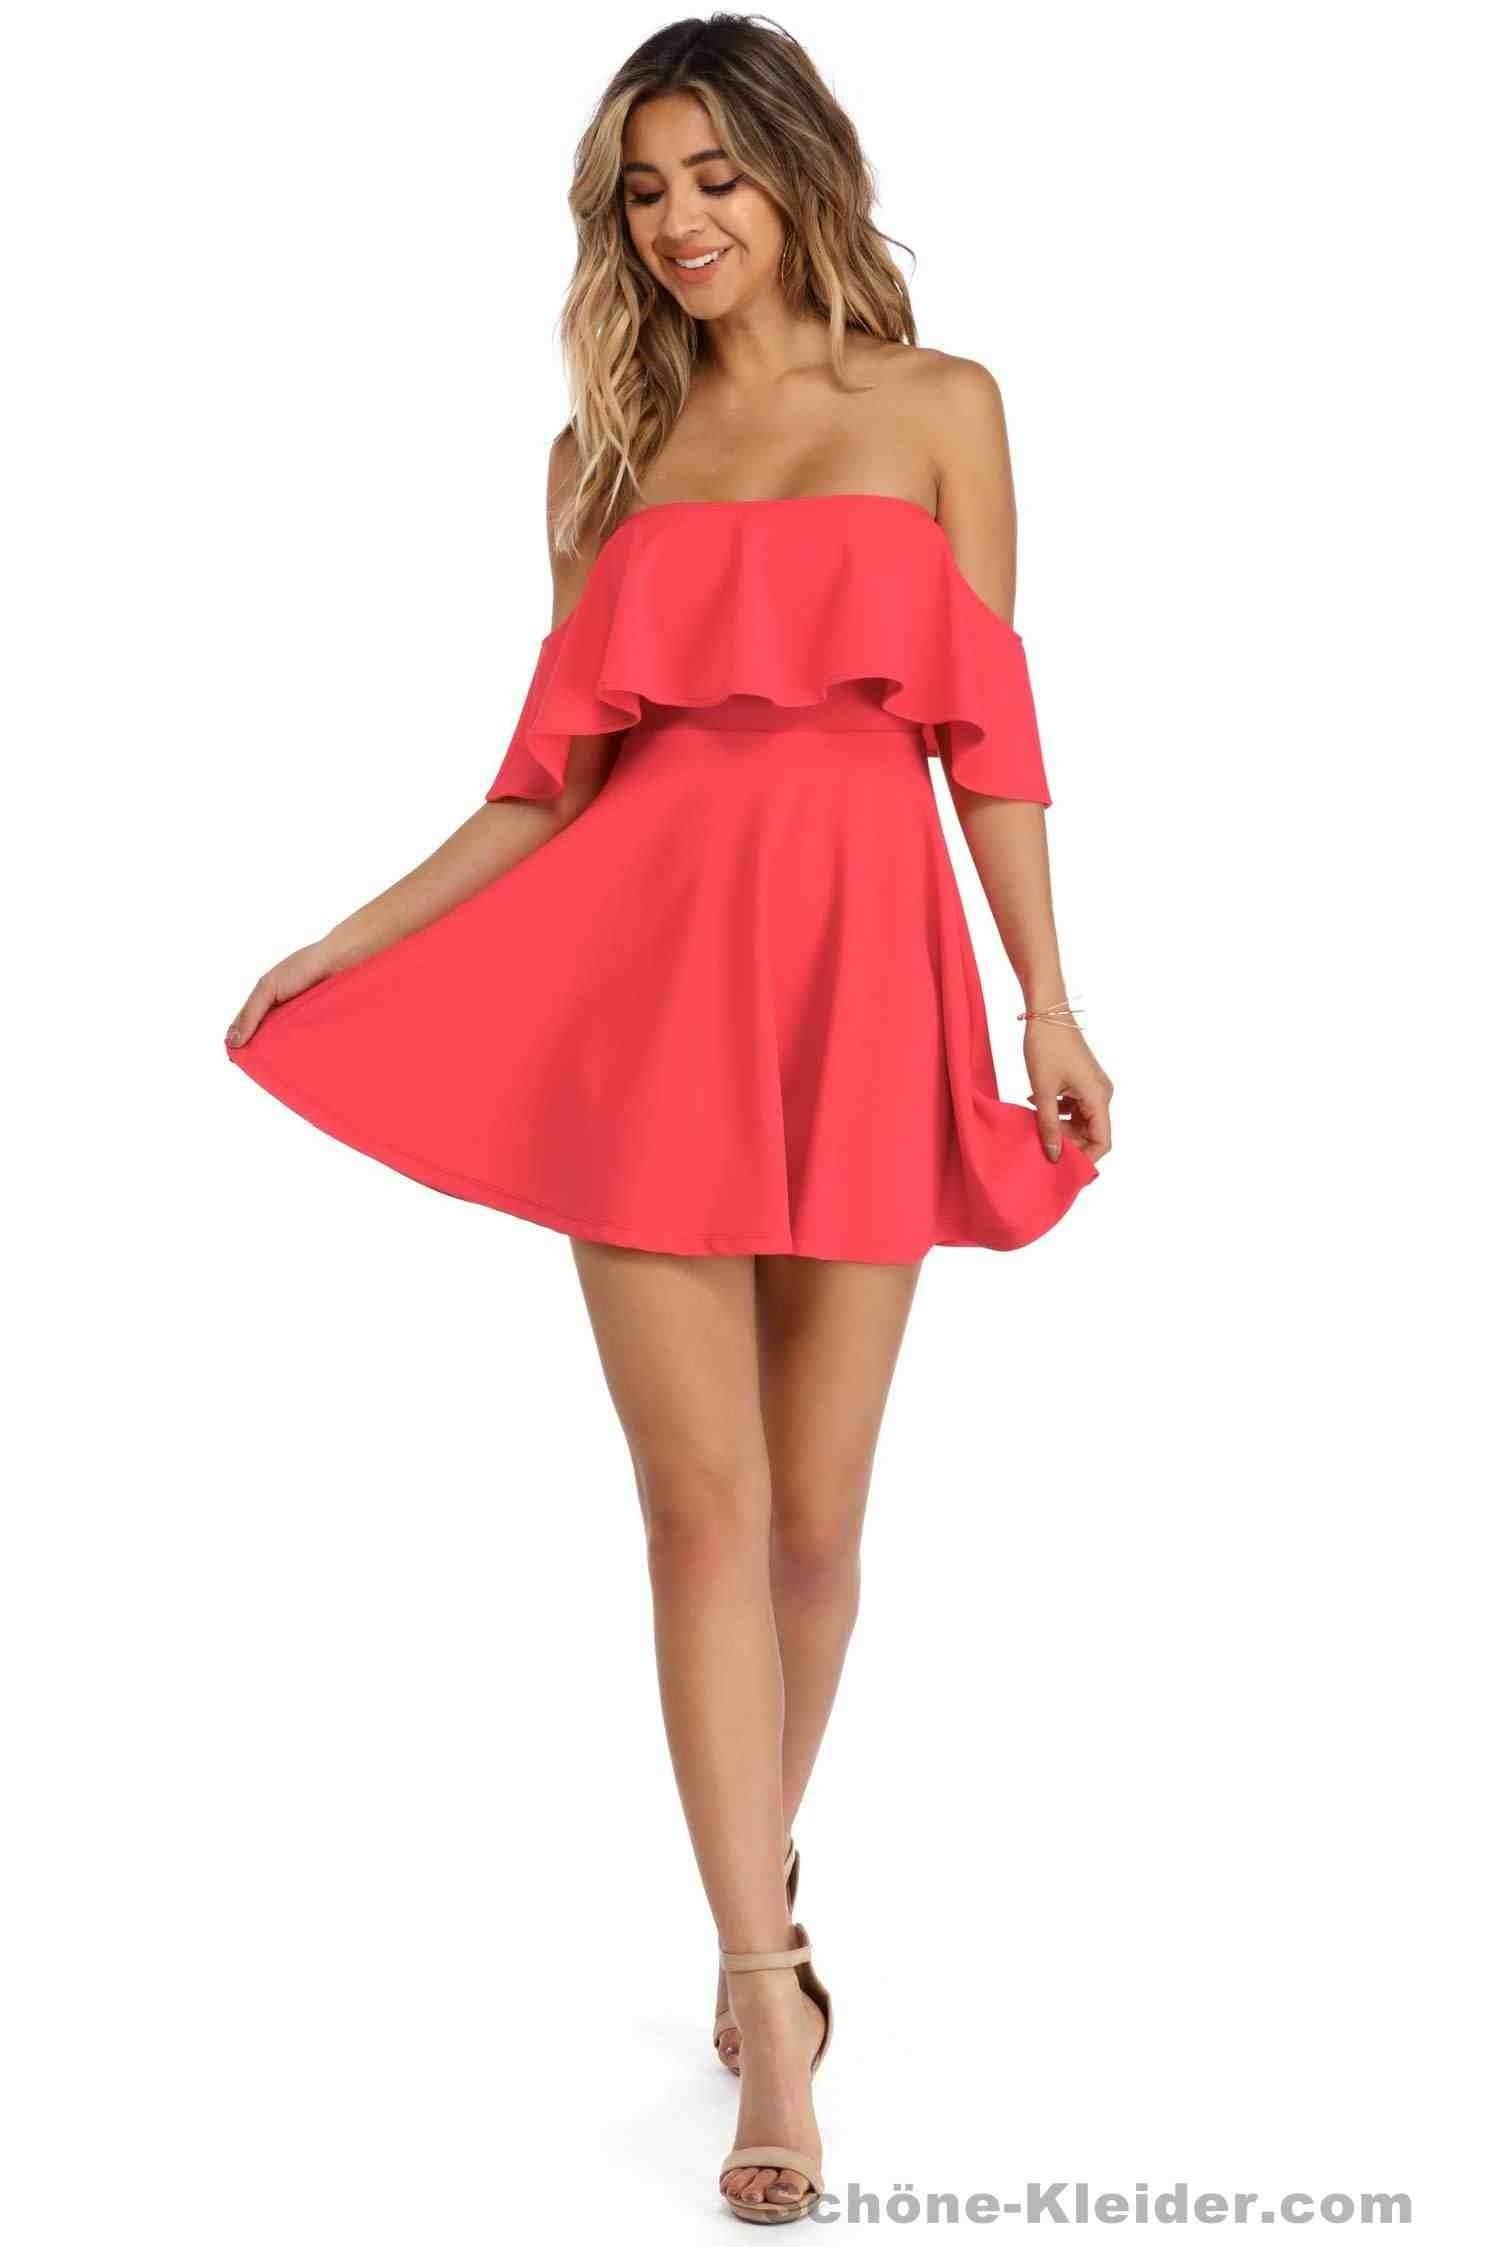 17 Perfekt Damen Abendkleider Kurz Boutique17 Fantastisch Damen Abendkleider Kurz Stylish